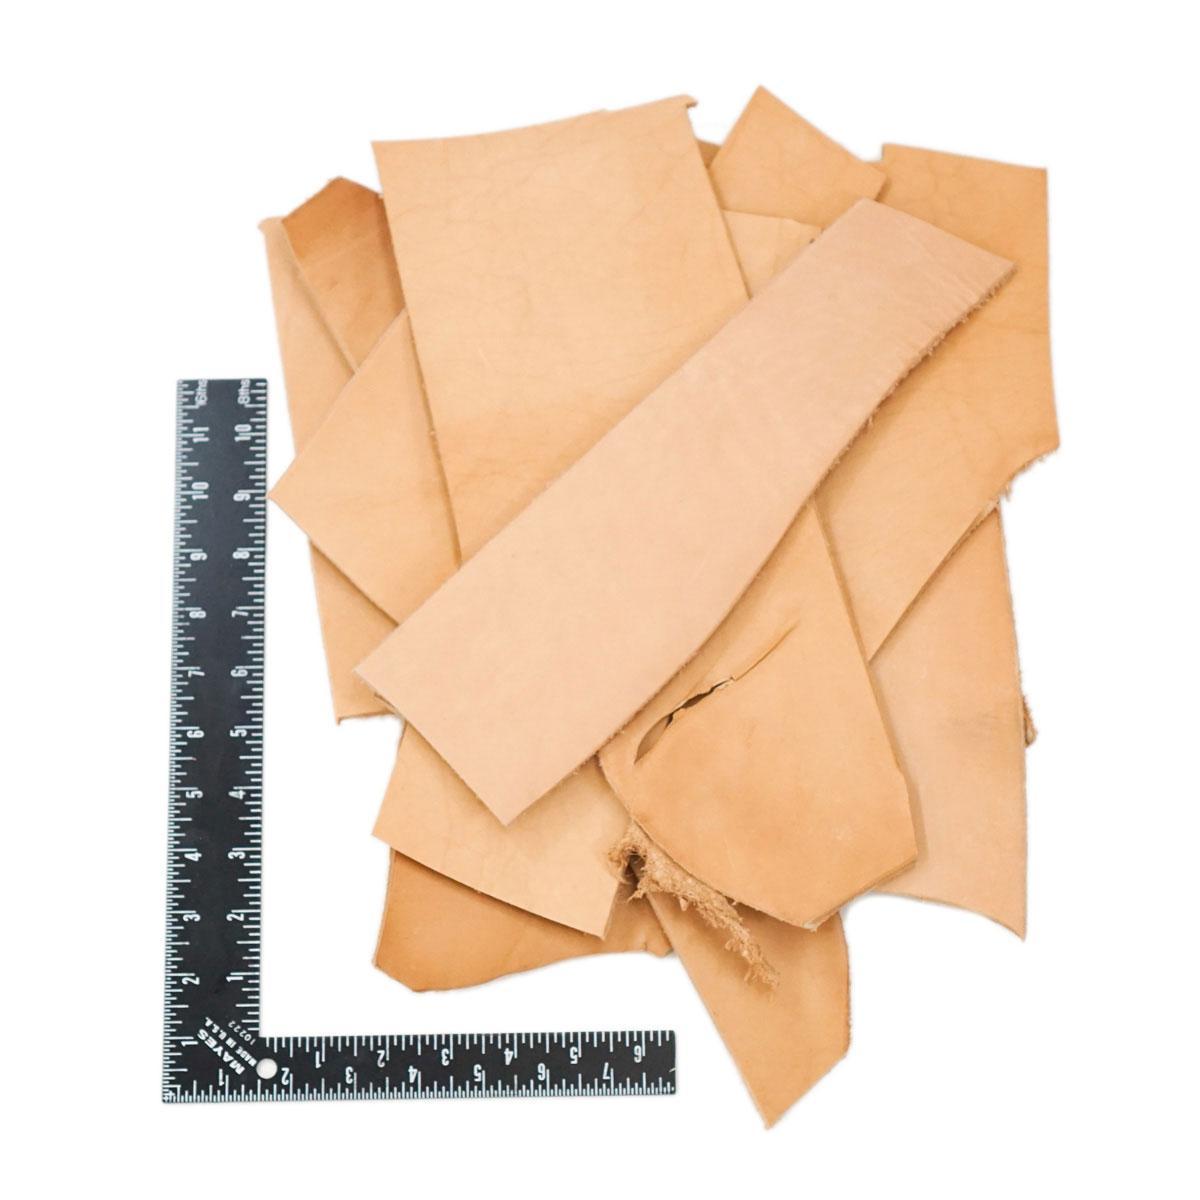 Job Lot of 20 x Veg Tan Leather Fobs Crafts